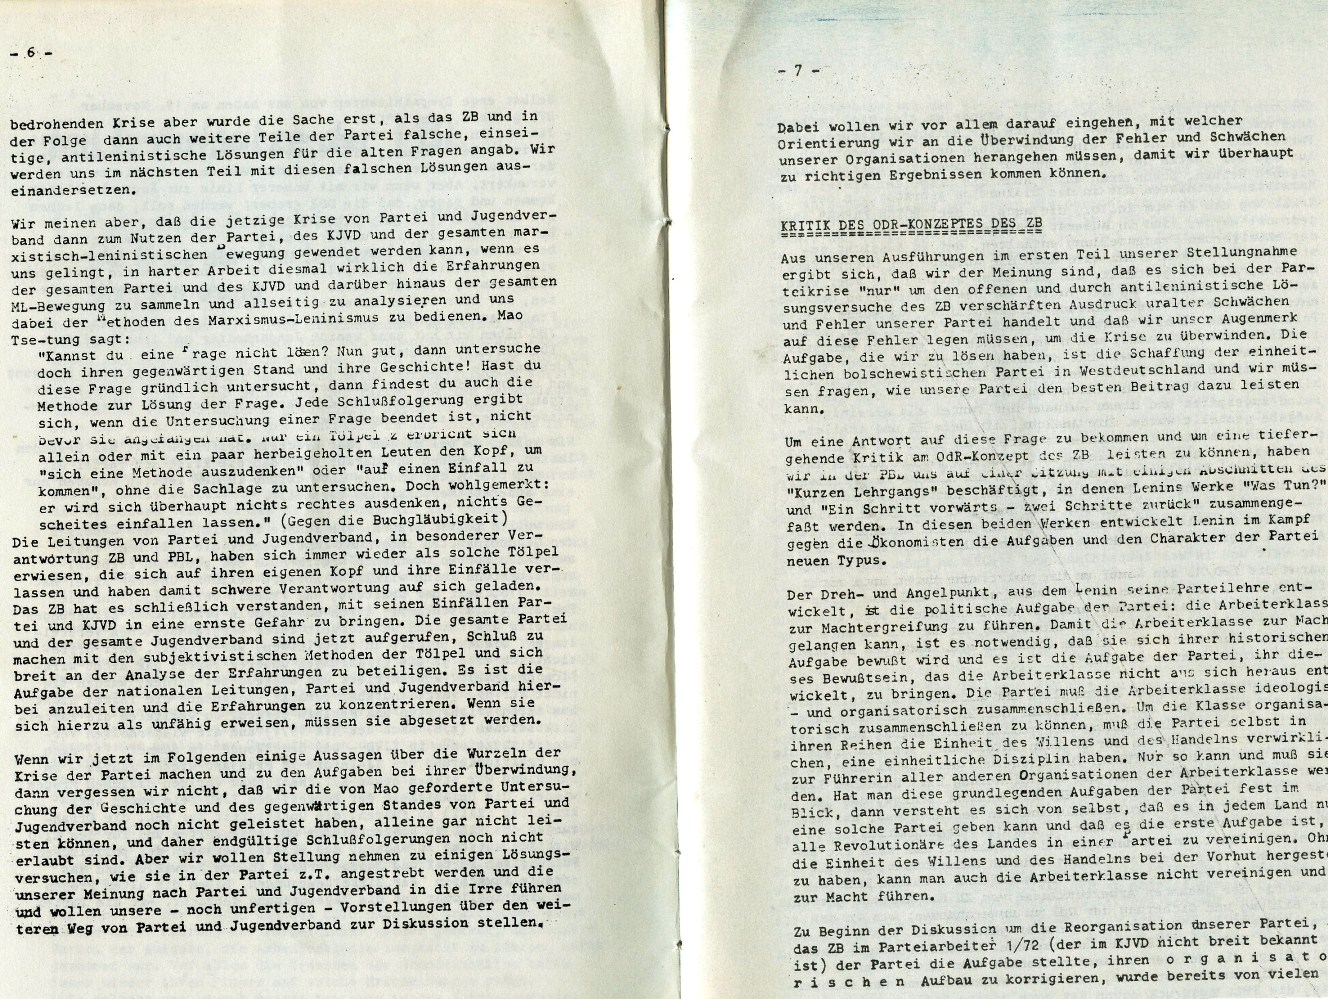 ZB_Universitas_1972_07